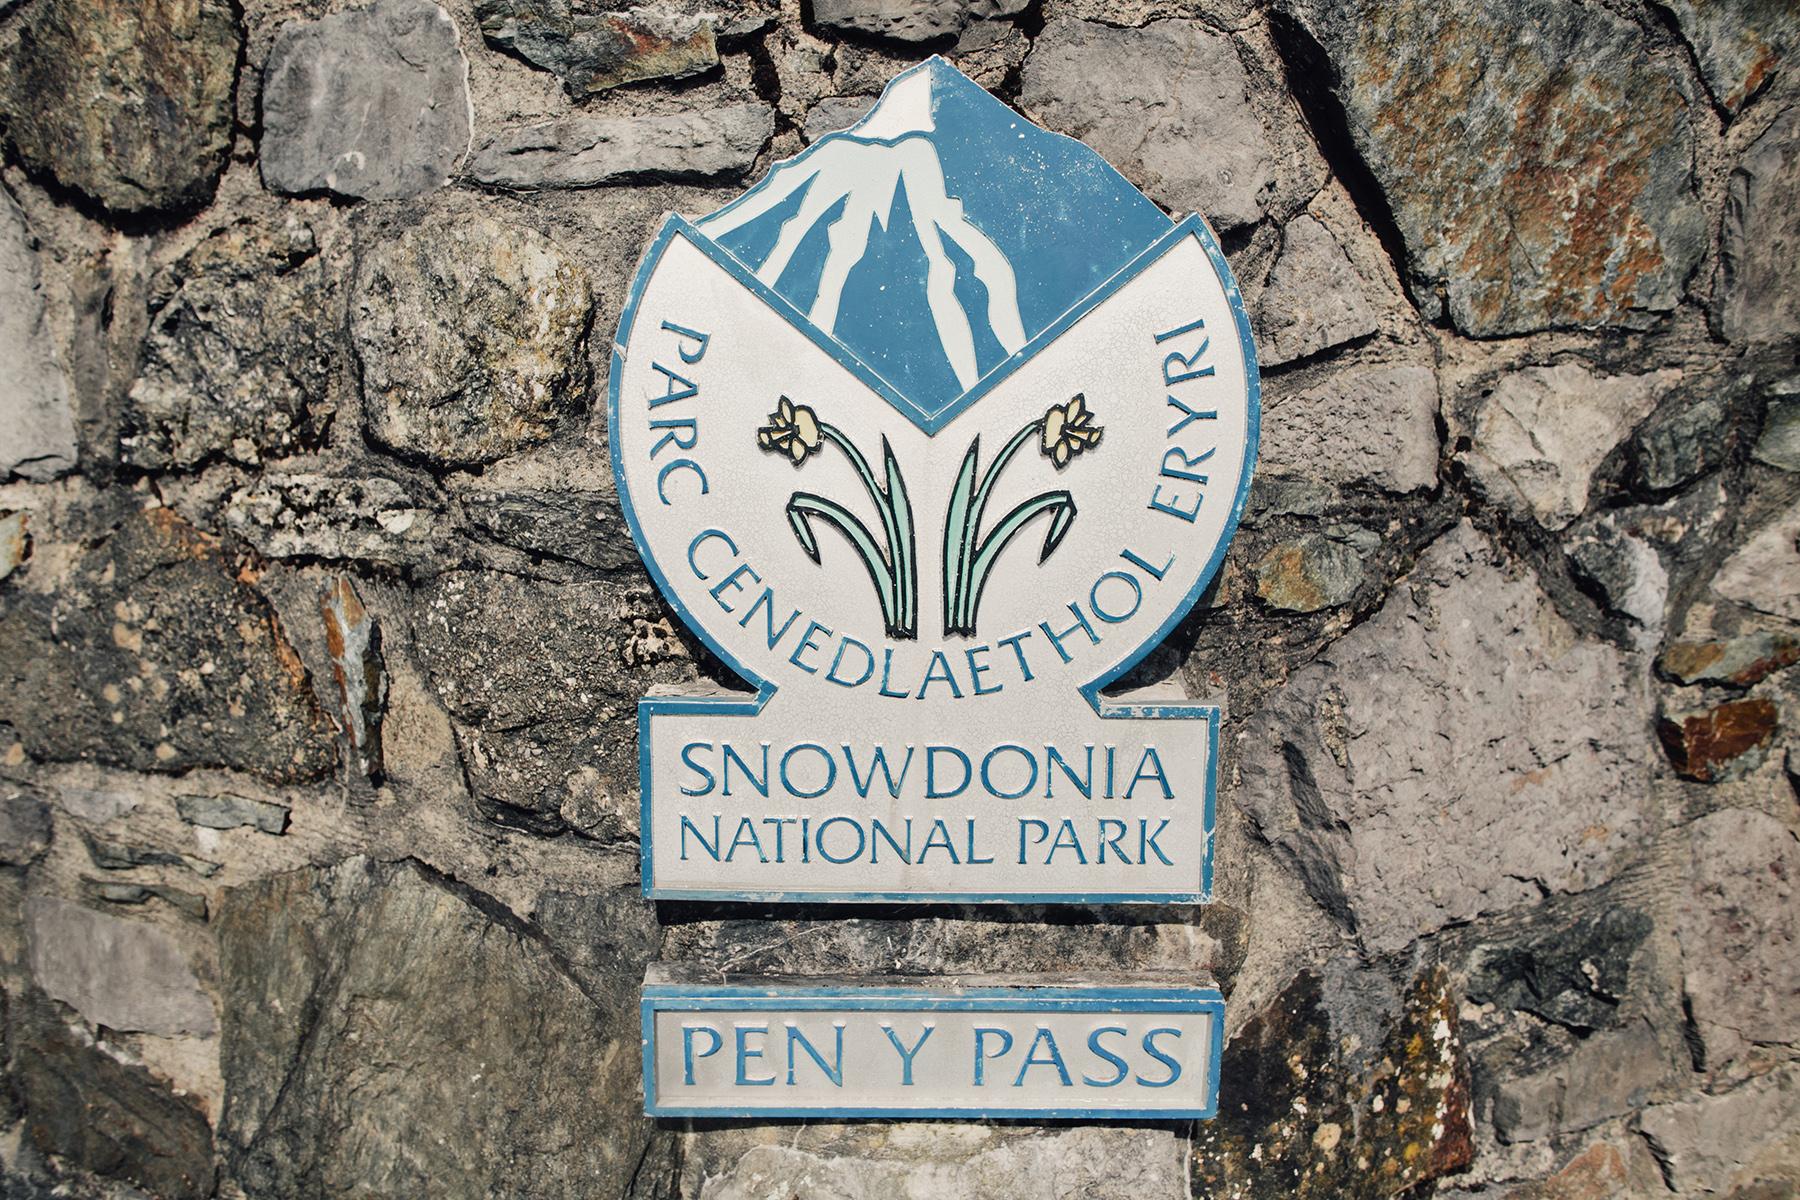 Mt-Snowdon-Hike-Photos-From-Peny-Pass-00021.jpg